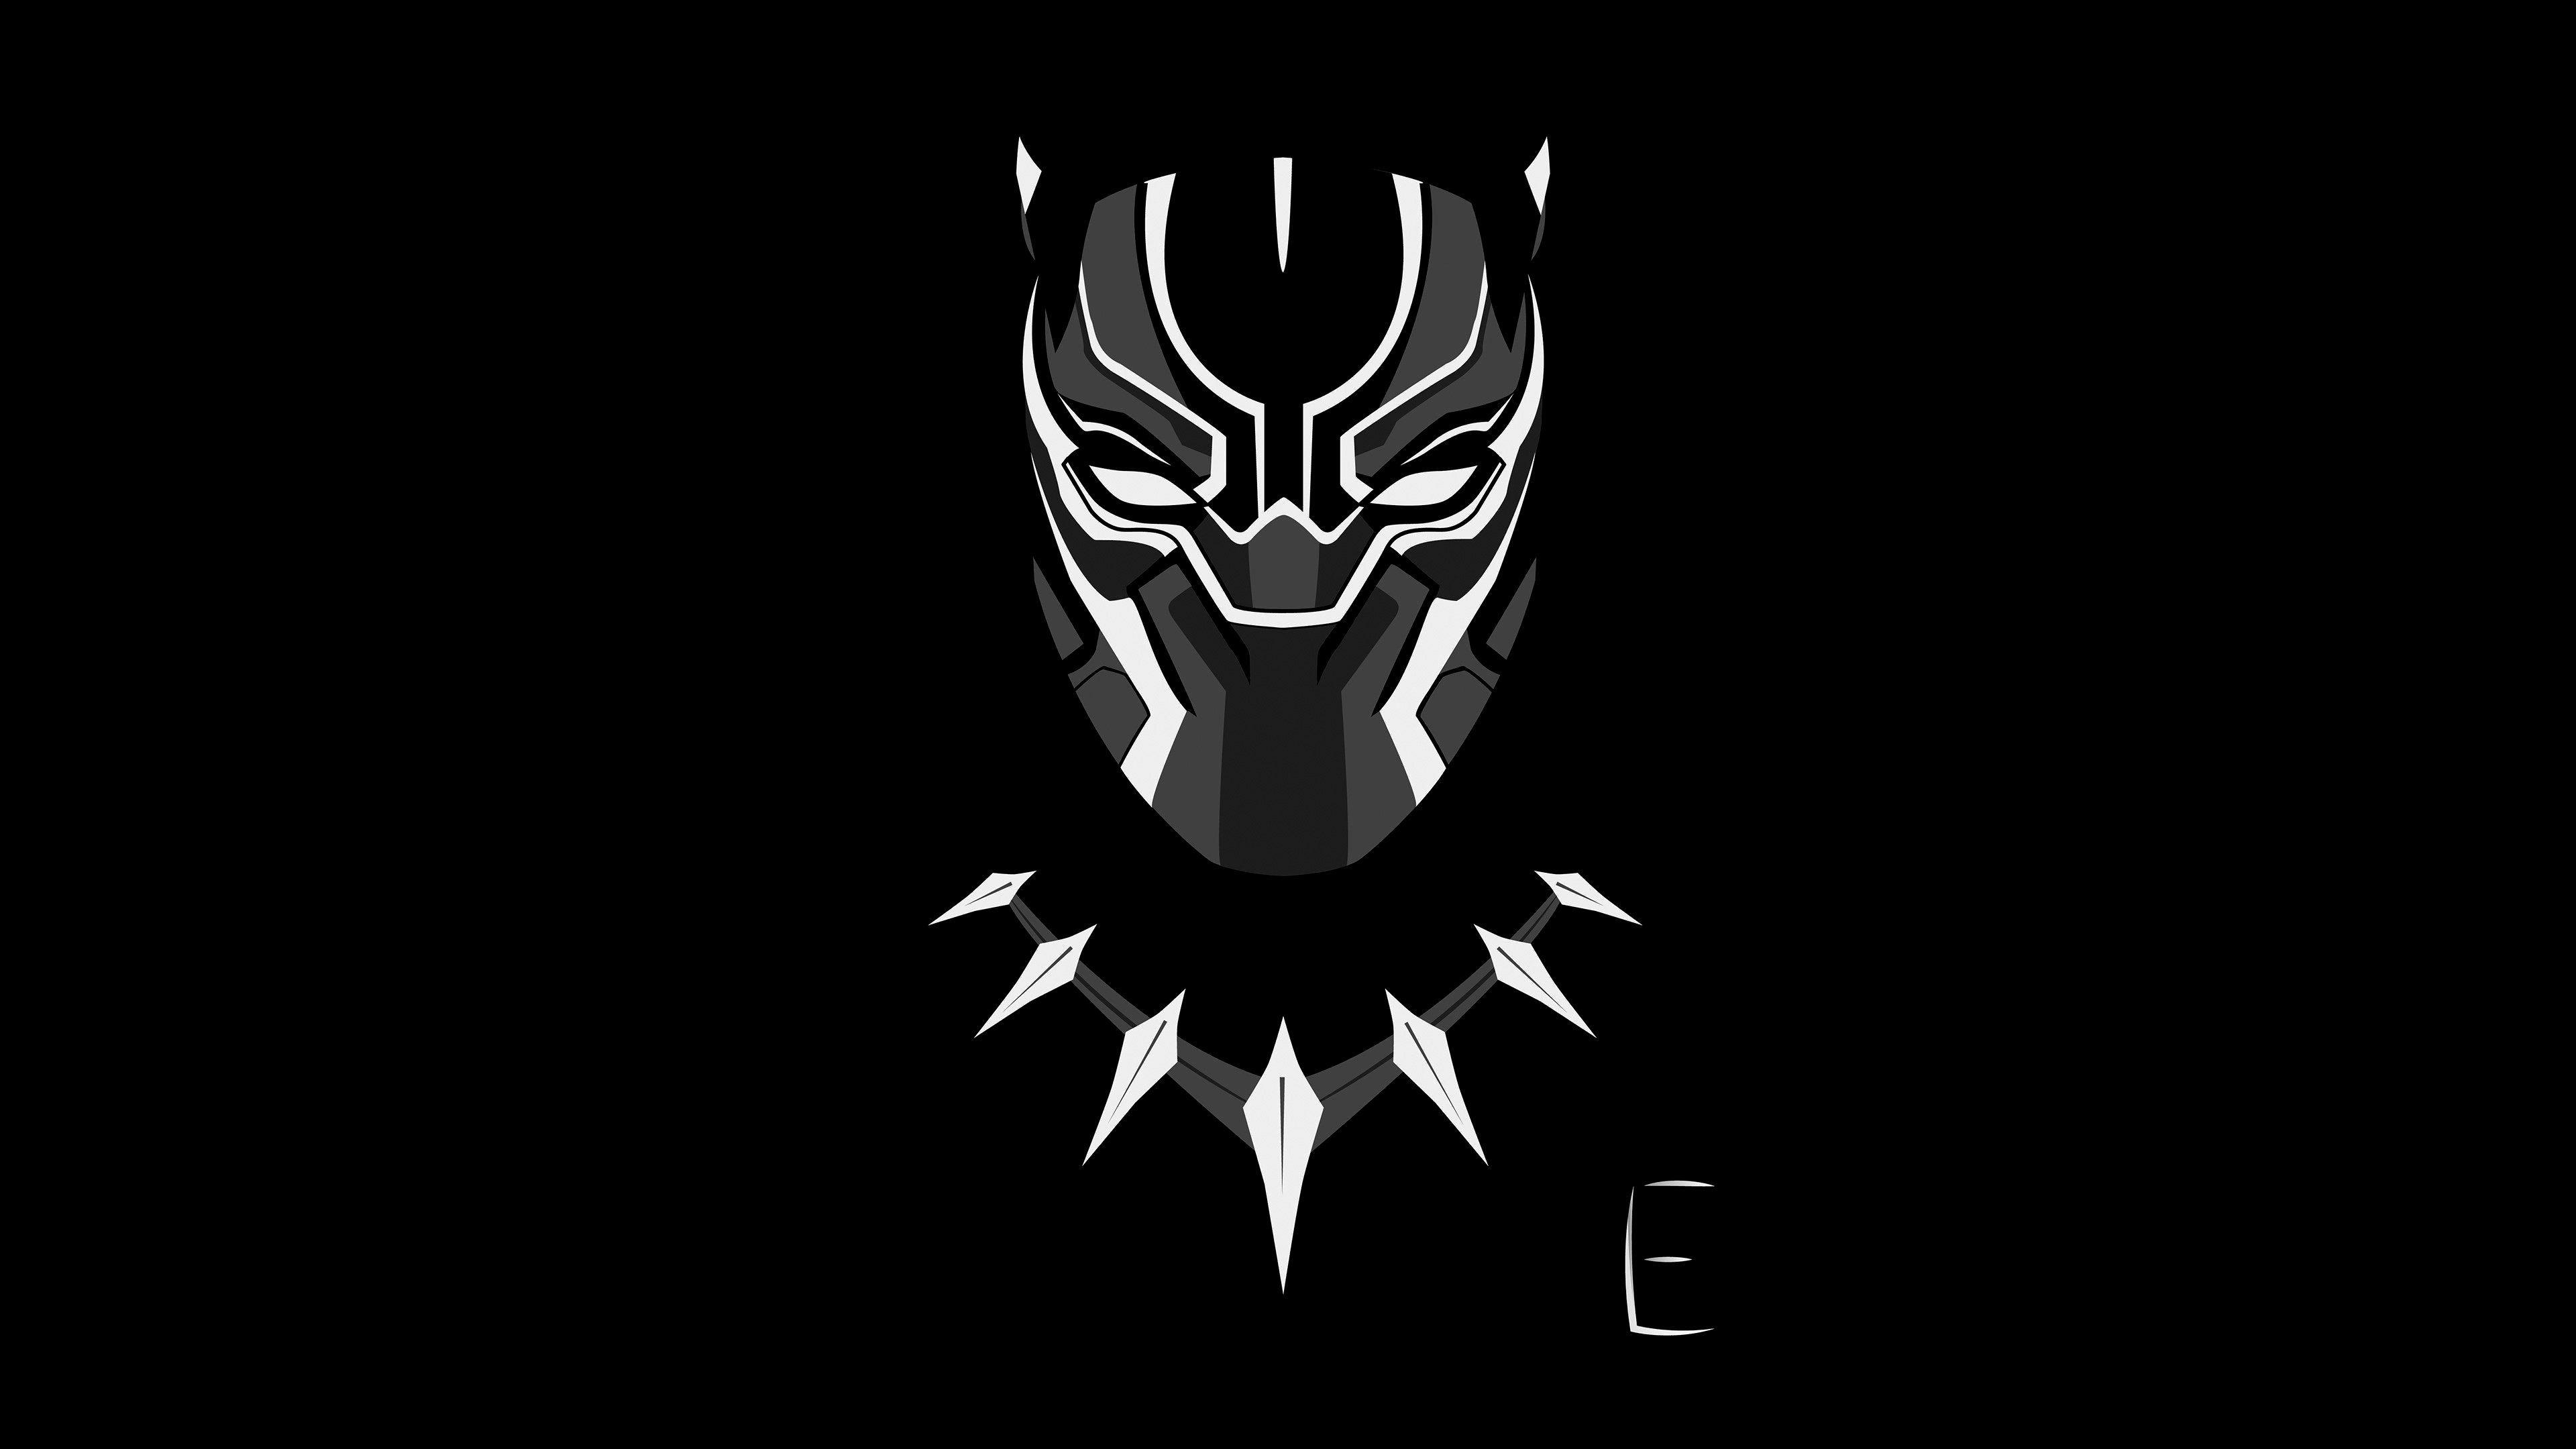 Dark Mask 4k Wallpaper Trick 4k Papeis De Parede Pc Papel De Parede Pc Wallpapers Para Pc